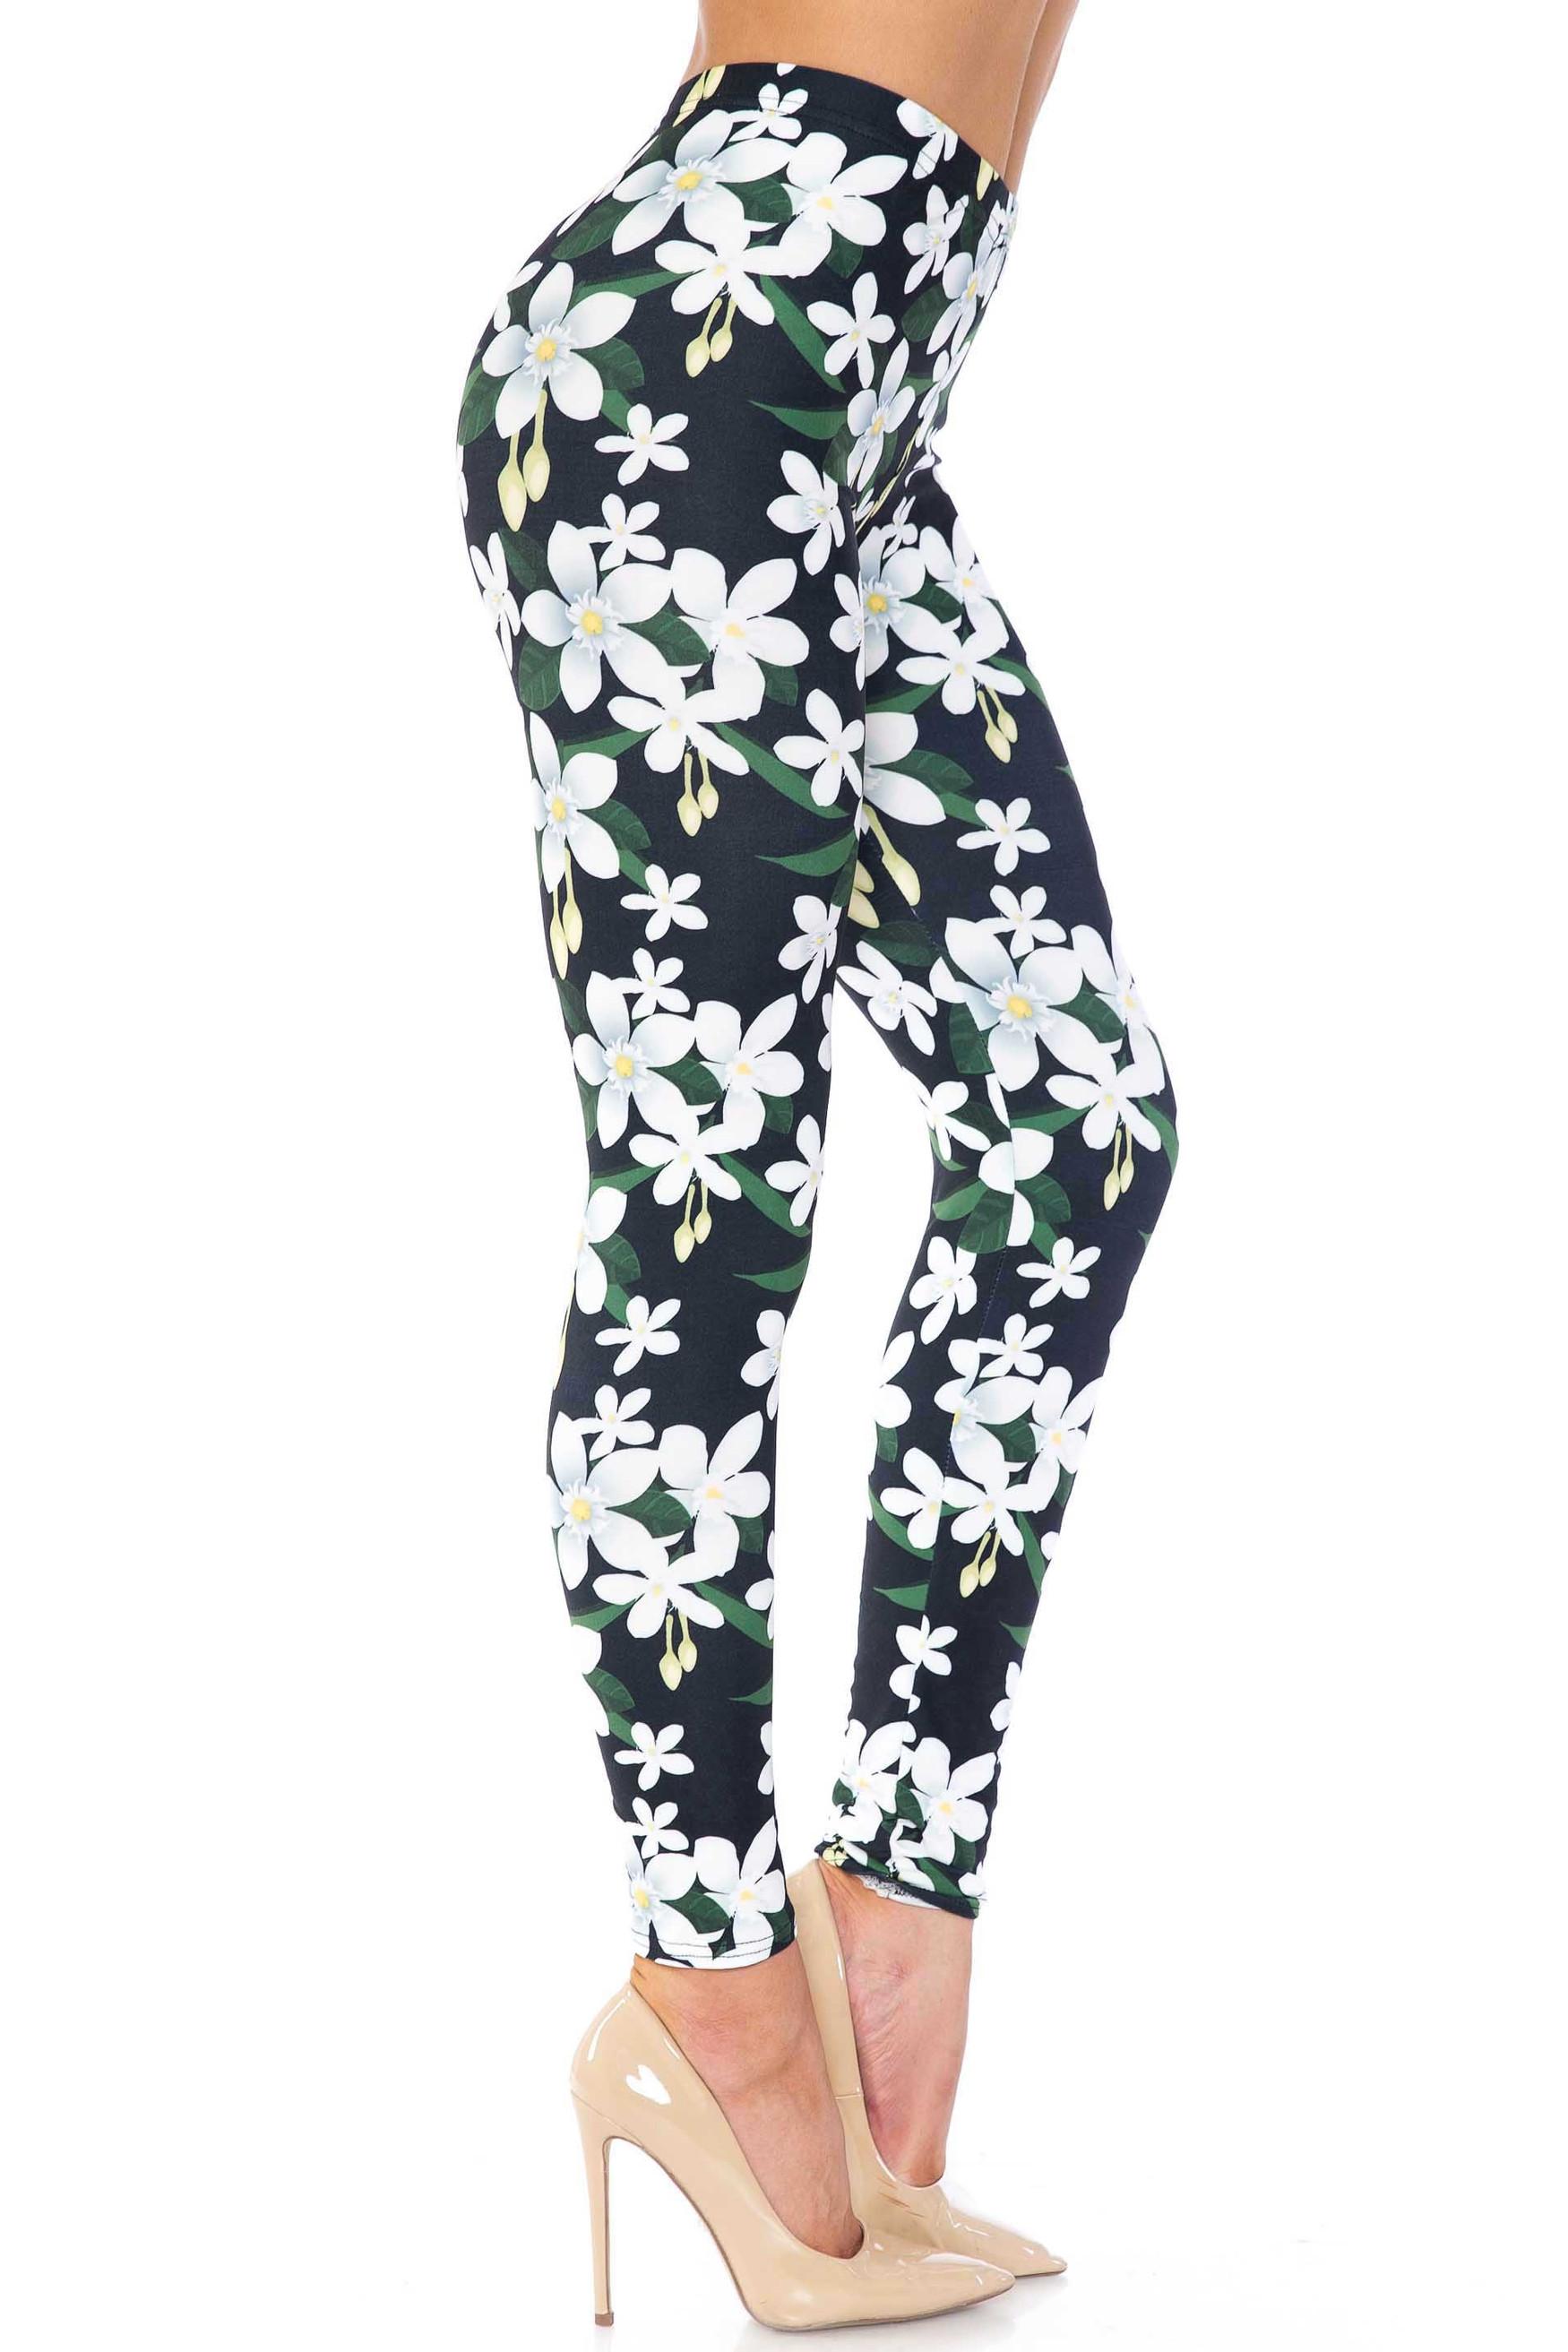 Creamy Soft Daisy Bloom Plus Size Leggings - USA Fashion™